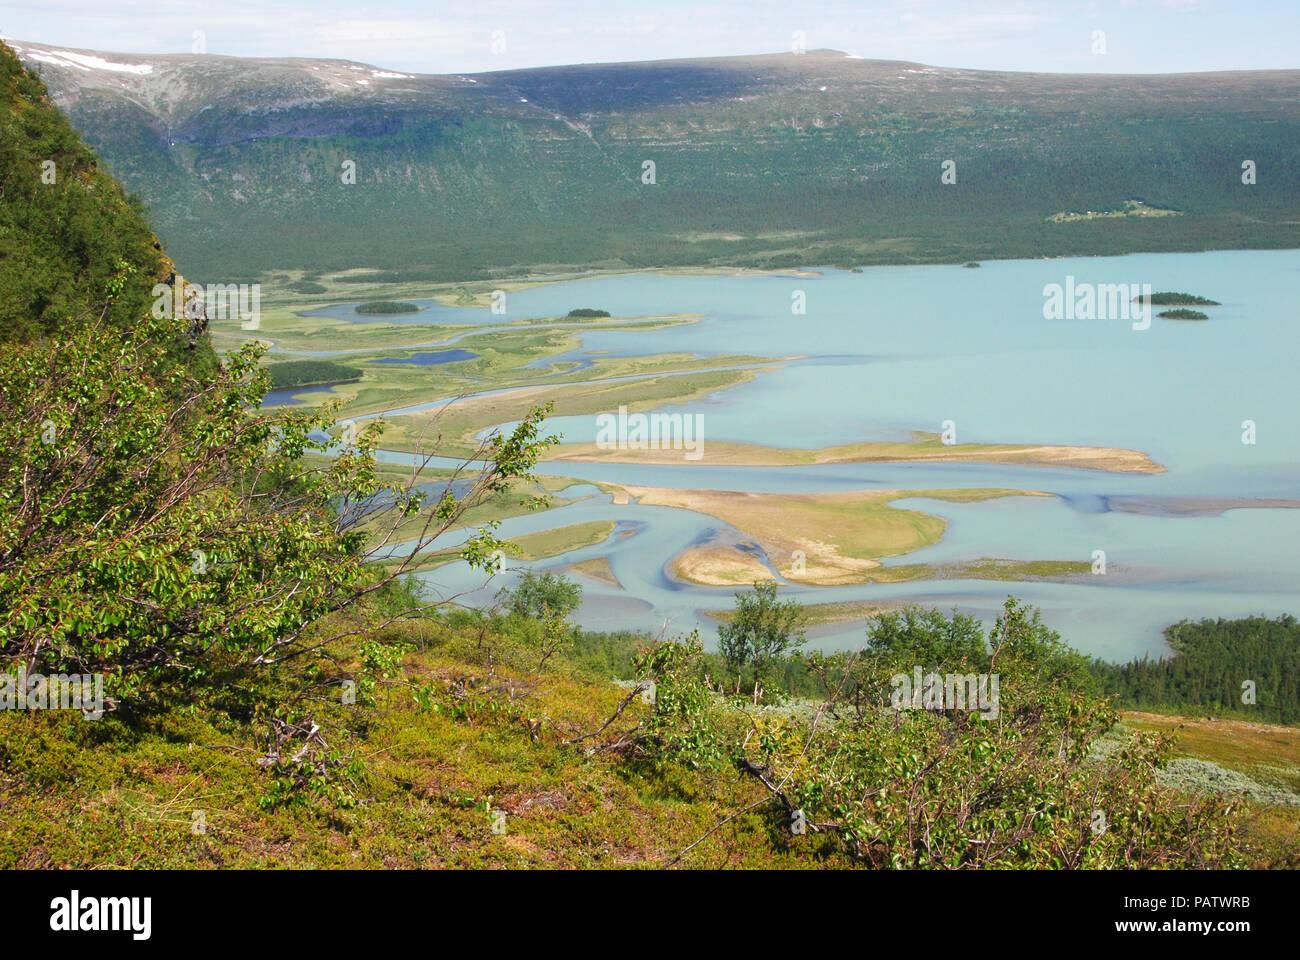 Rapaätno delta and Aktse. Jokkmokk, Norrbotten, Sweden. Stock Photo